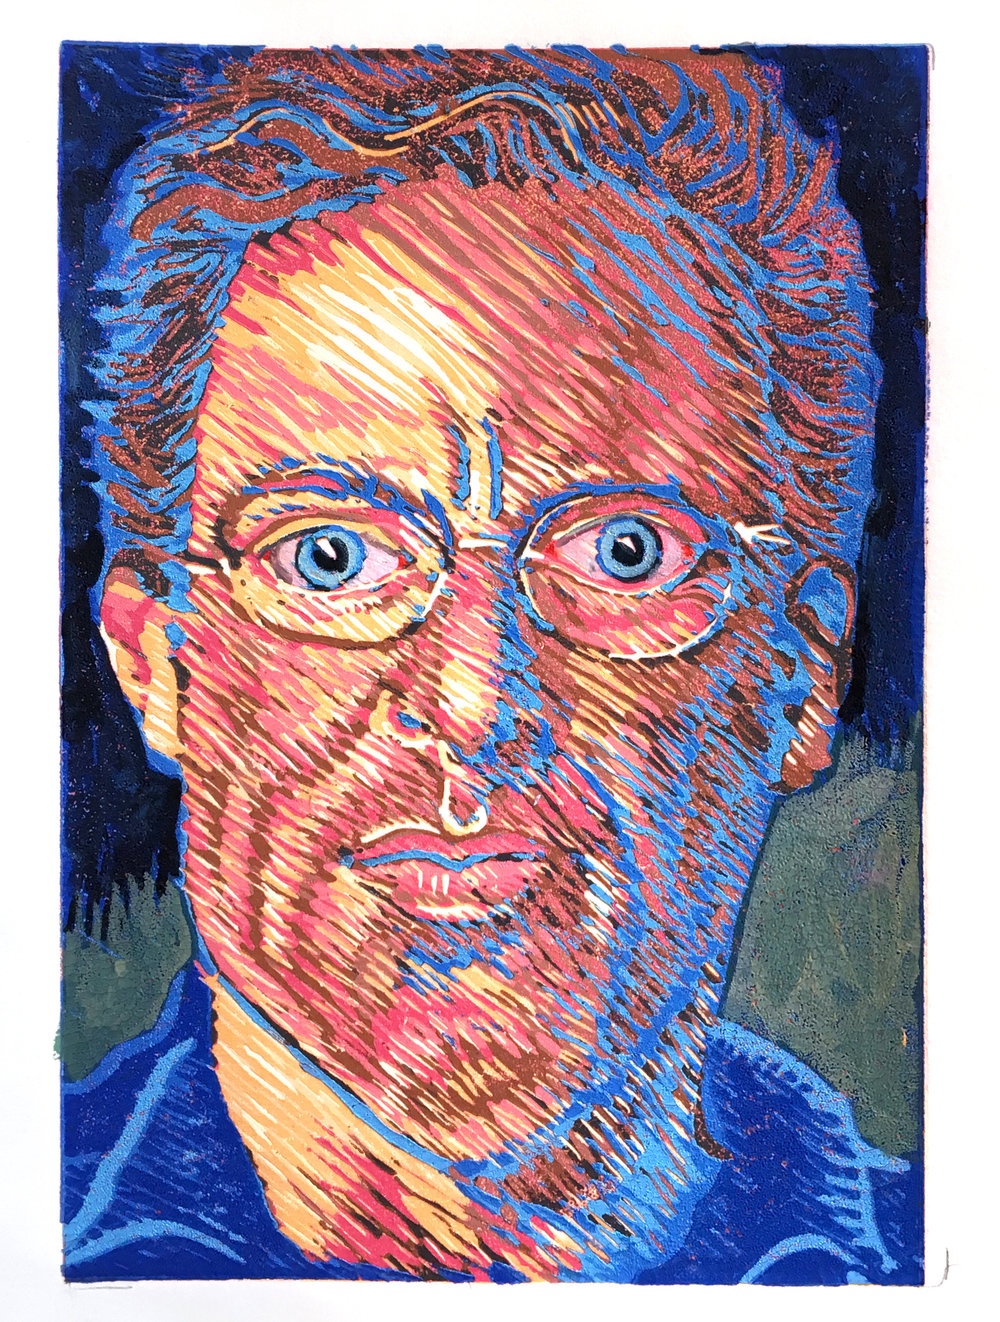 Self-Portrait Blue Boy